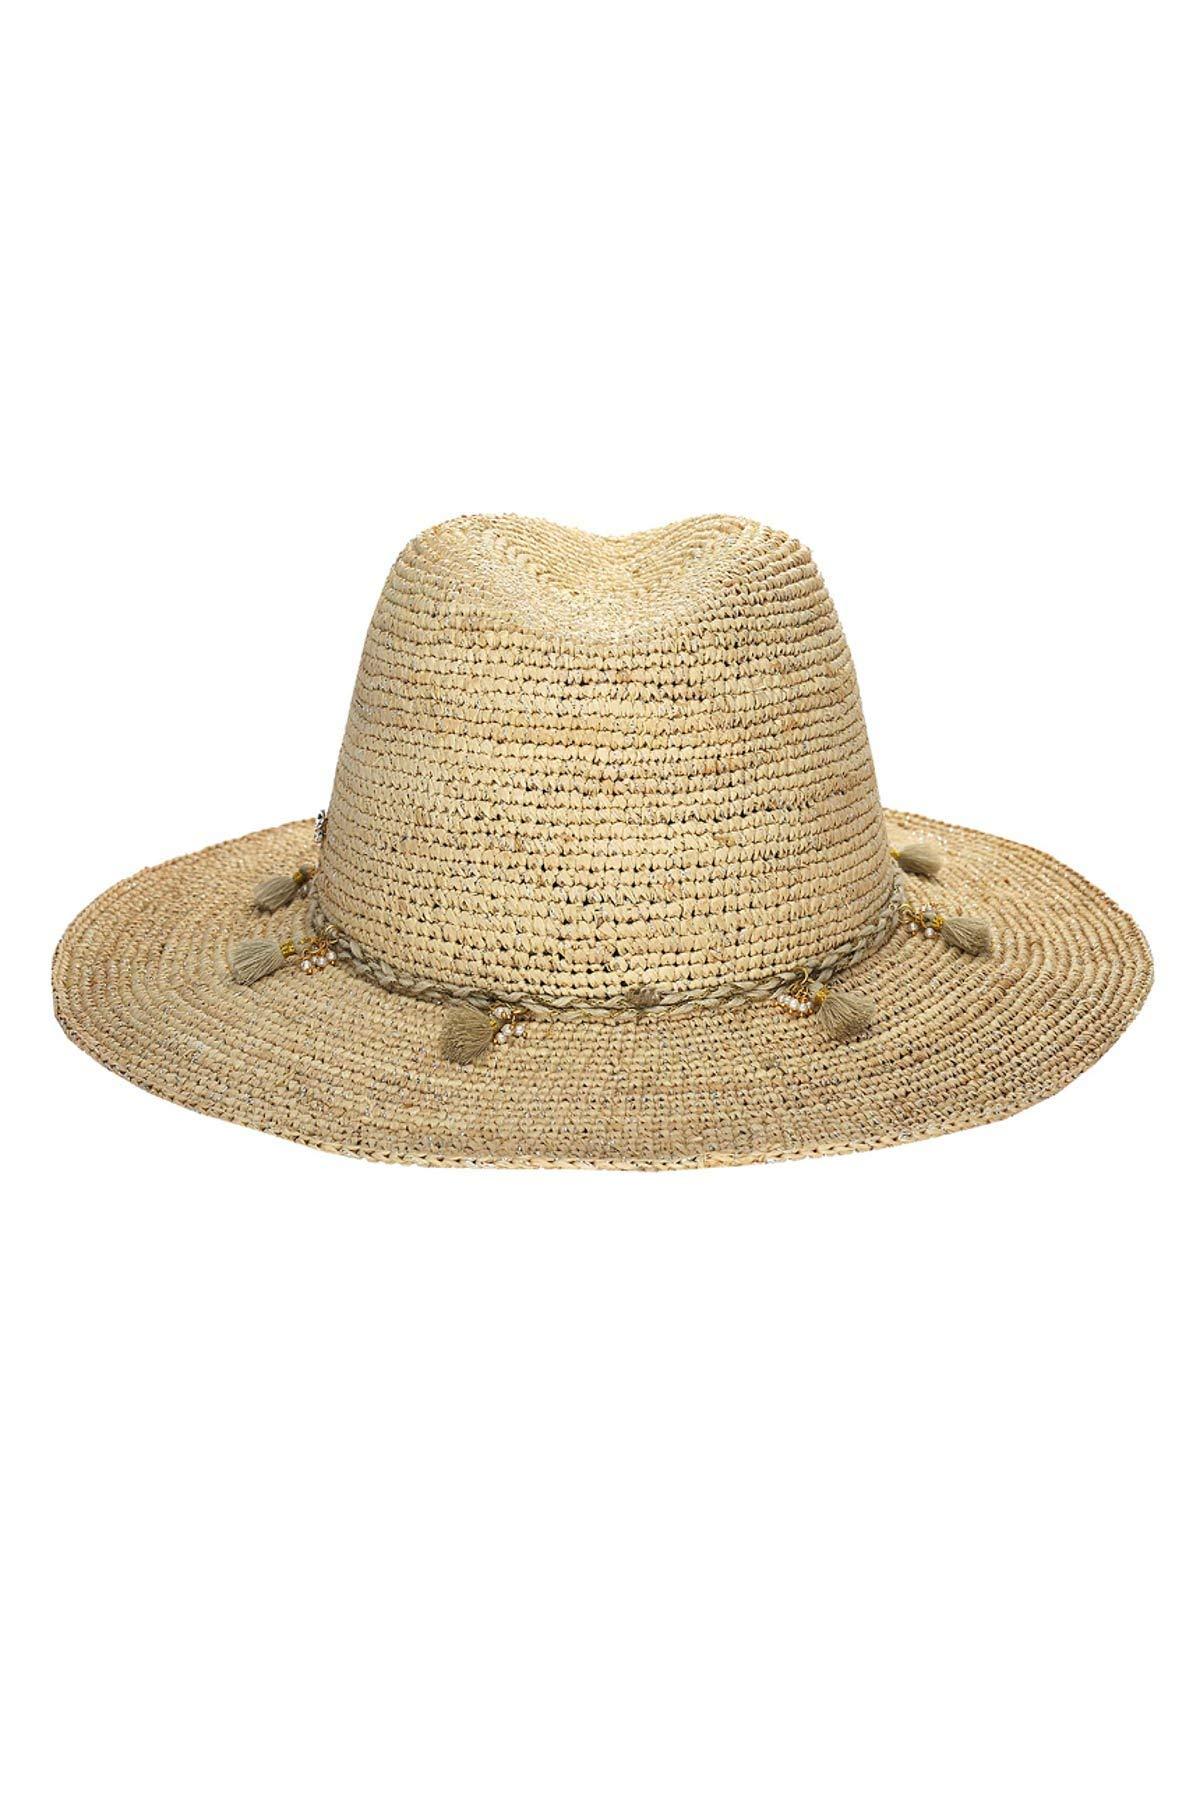 Florabella Tayor Tassel Trim Hat Natural/Silver One